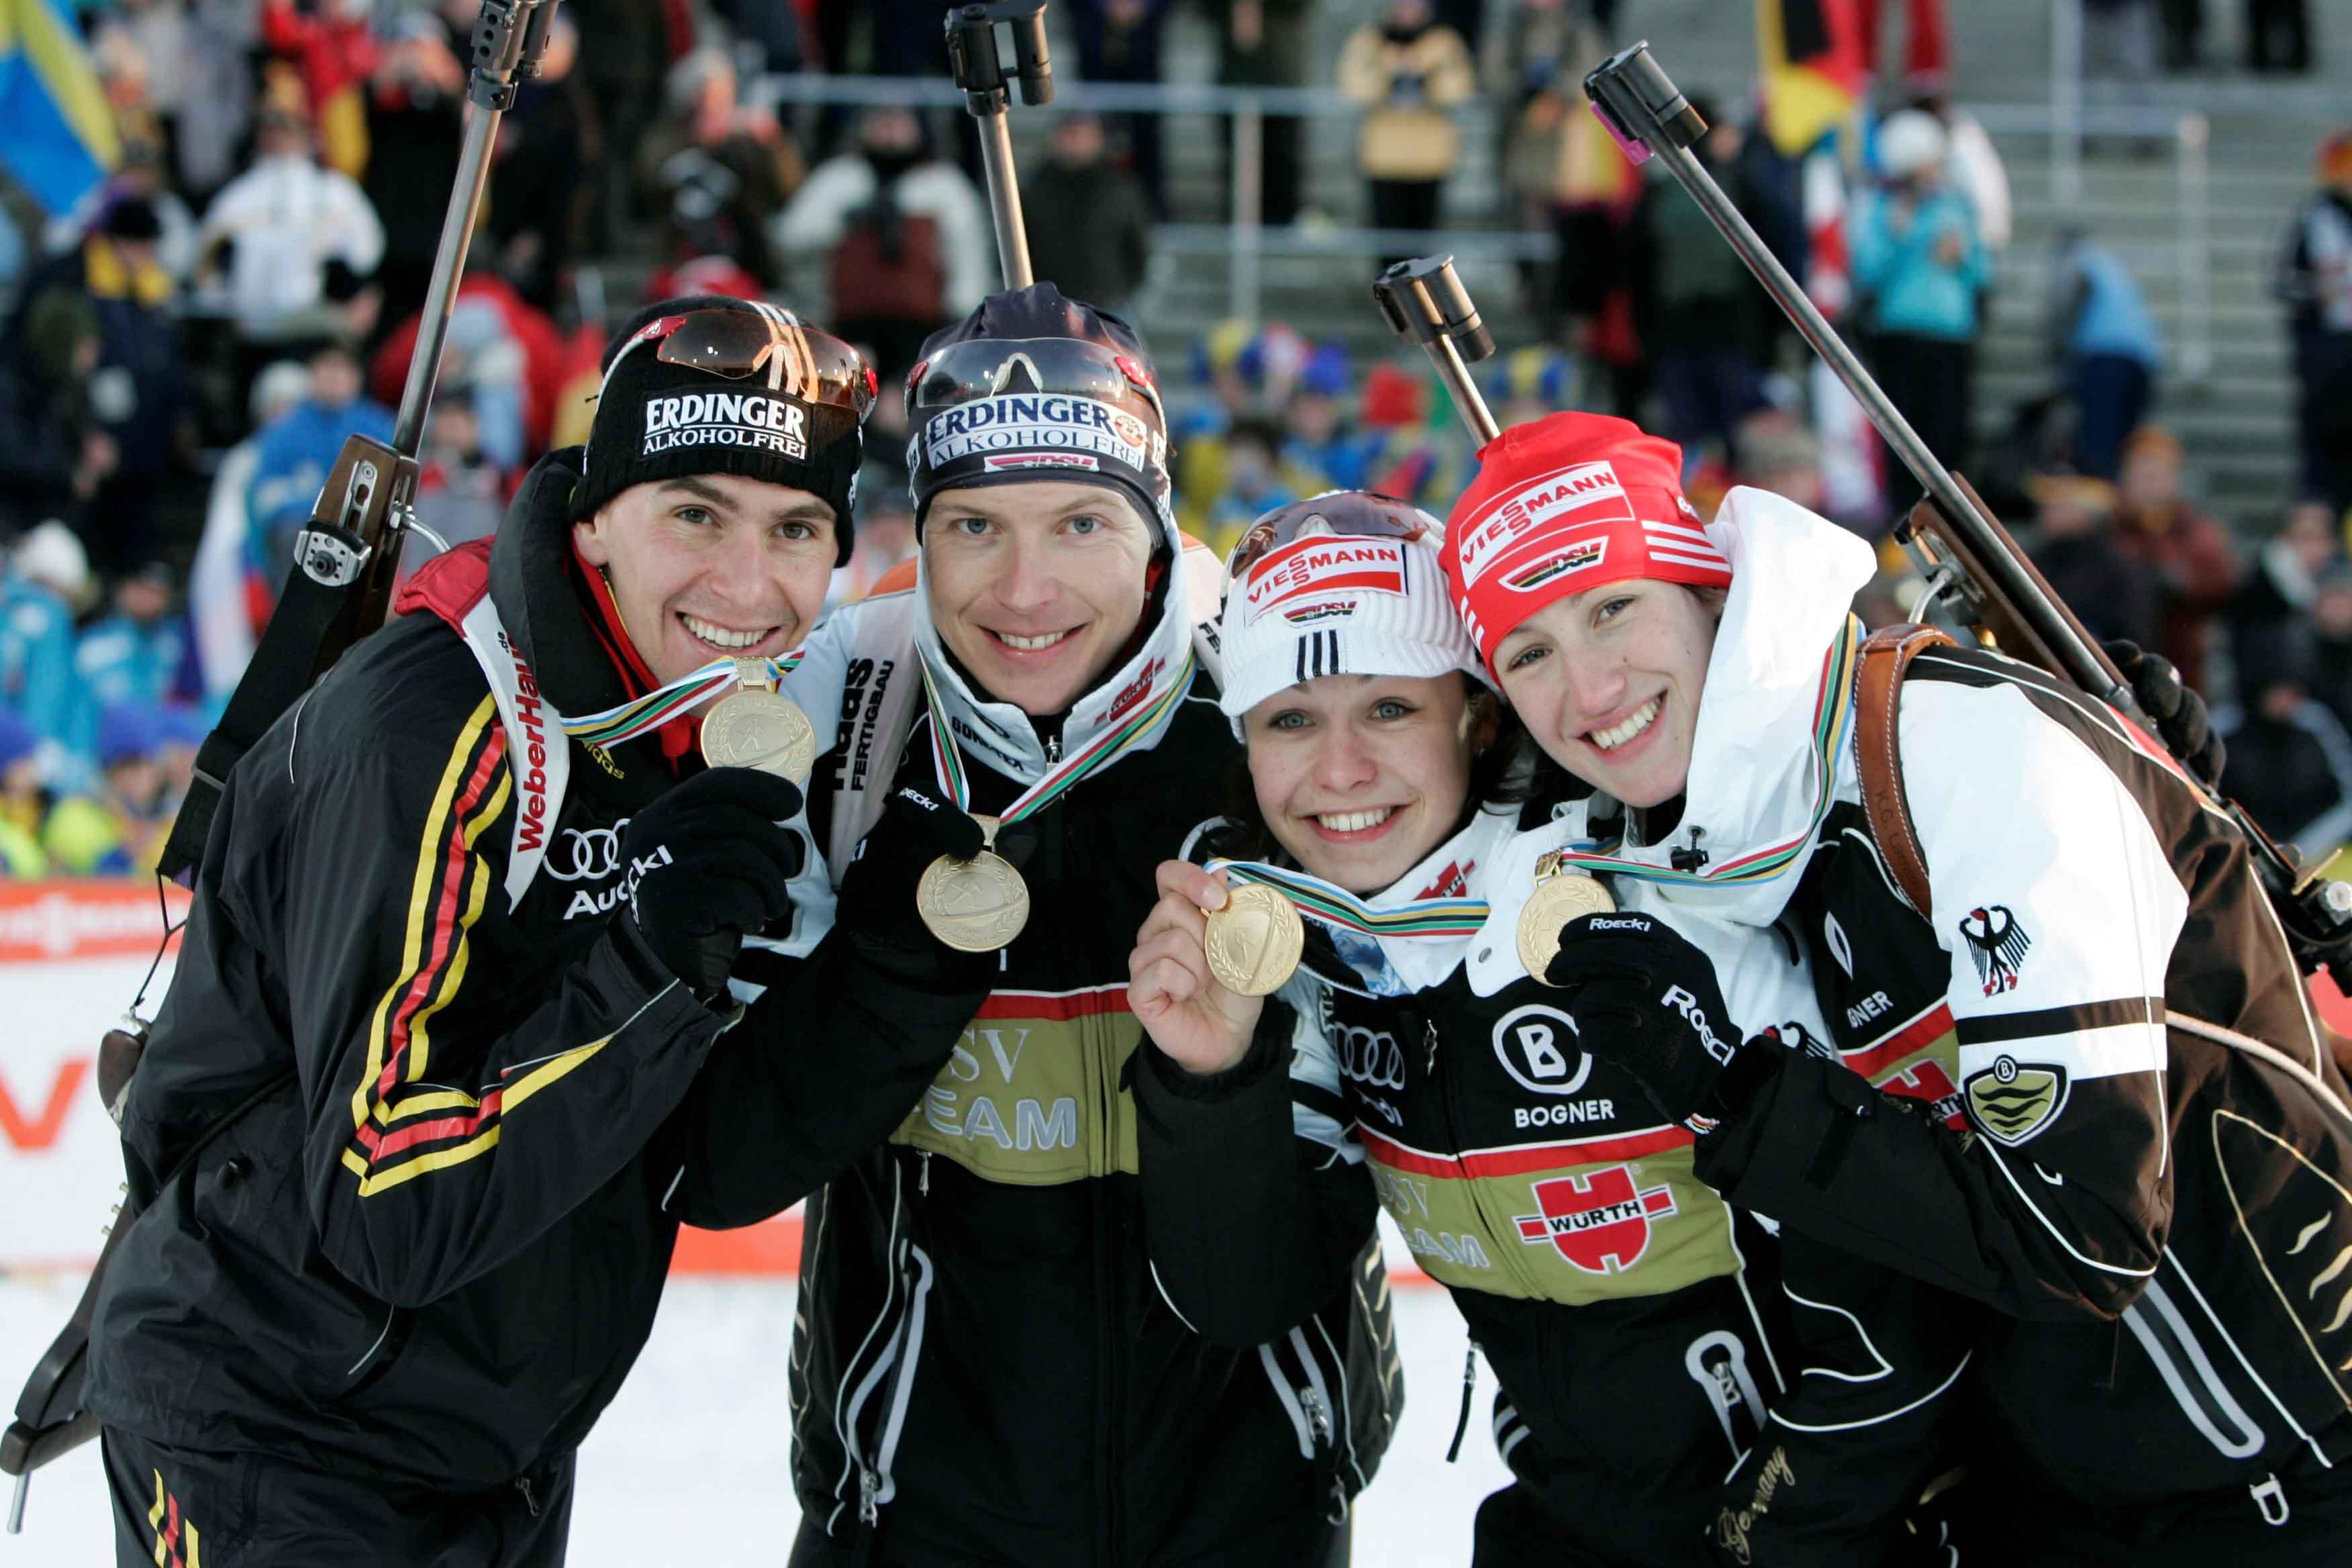 Sabrina Buchholz (rechts neben Magdalena Neuner, Andreas Birnbacher und Michael Greis) nach dem Gewinn des WM-Titels 2008 in der Mixedstaffel. Foto: Christian Manzoni